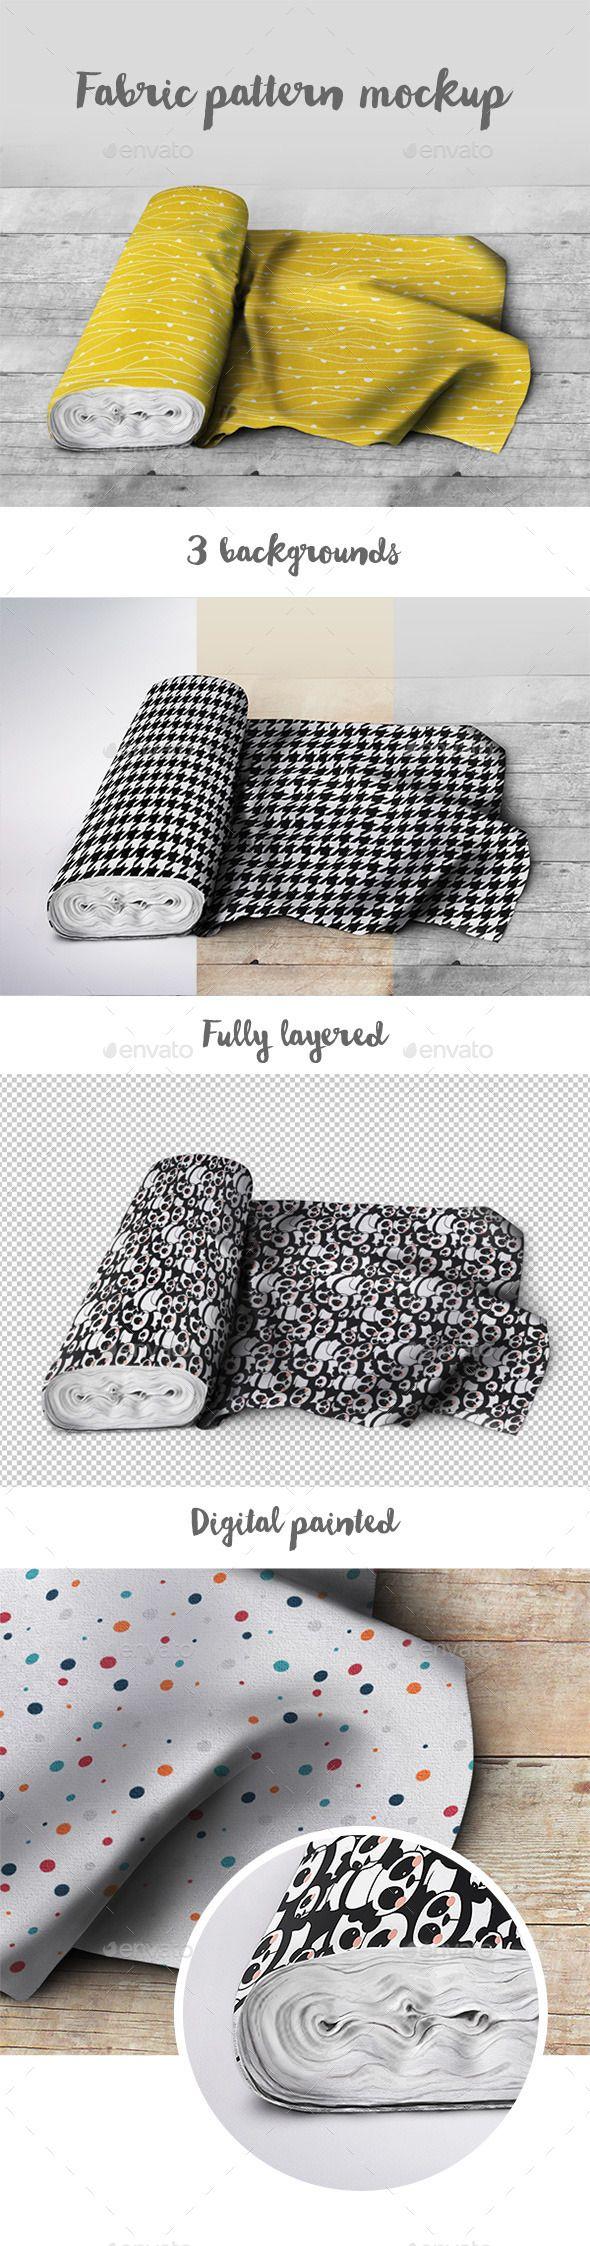 Fabric Pattern Mockup  — PSD Template #3000x2019 #pattern #design…